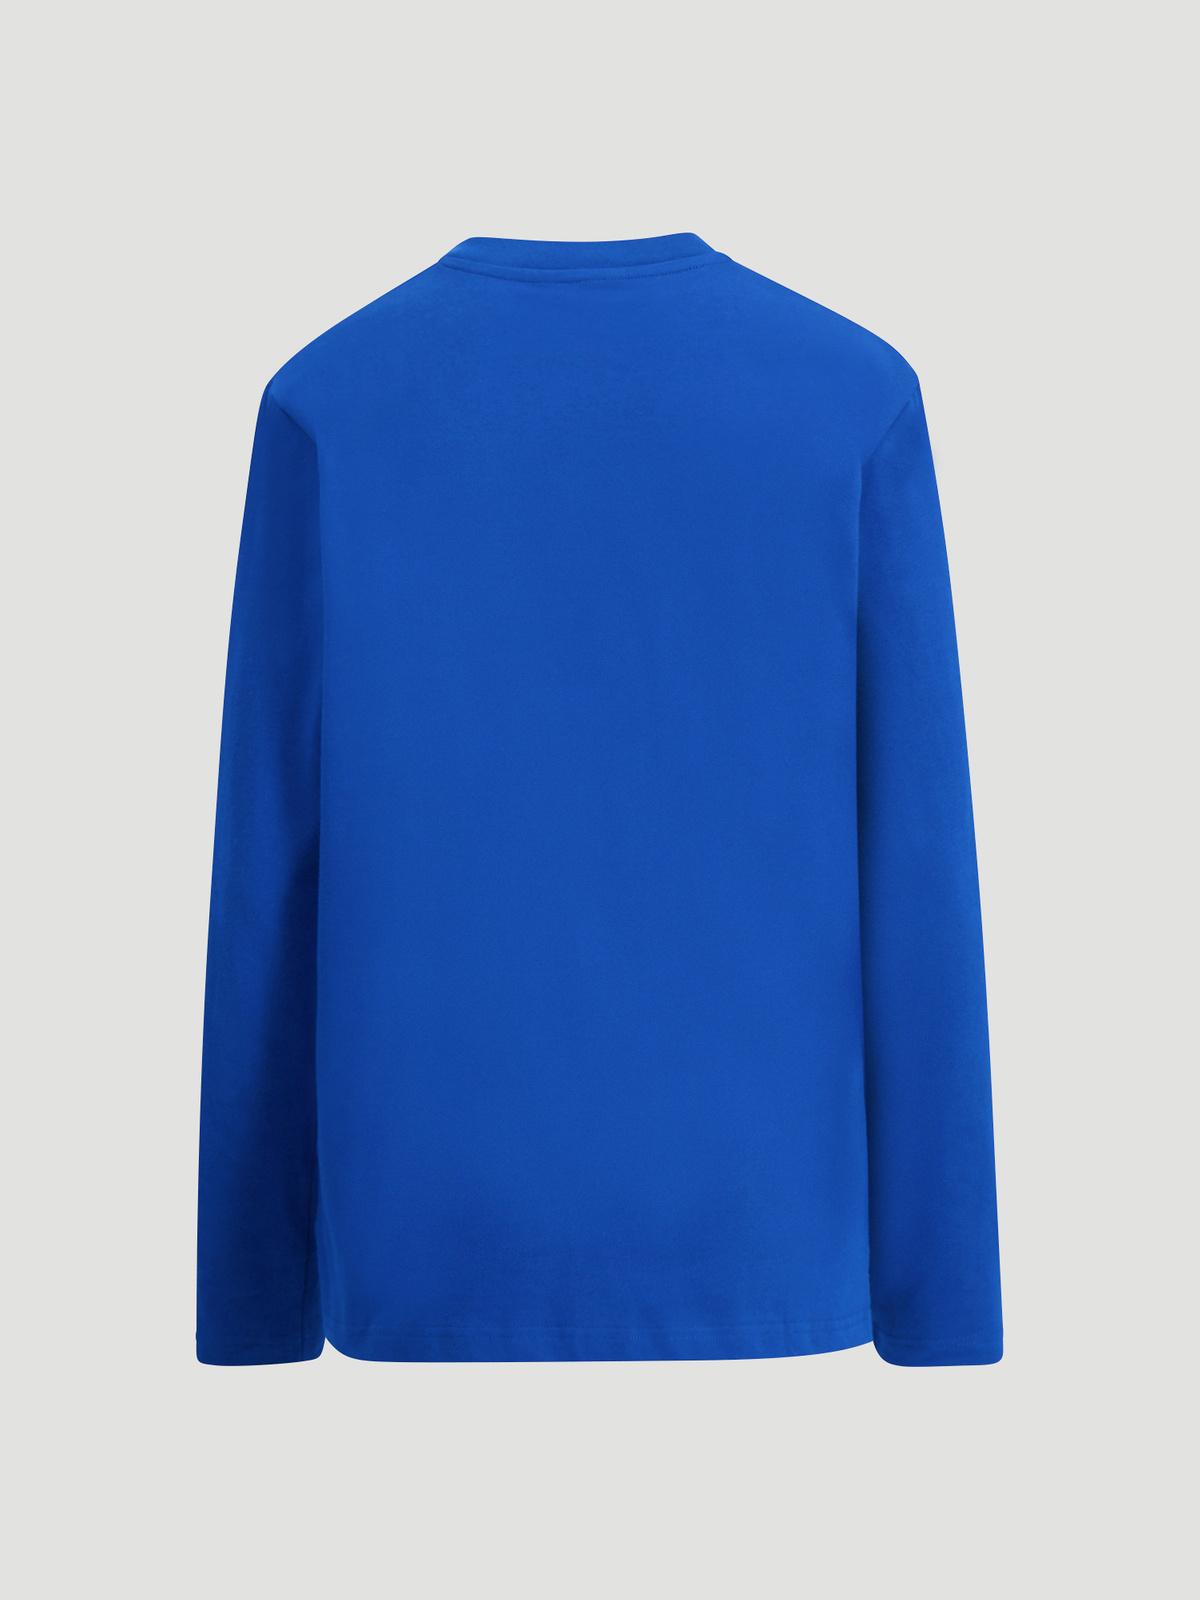 Hanger Longsleeve Blue 1